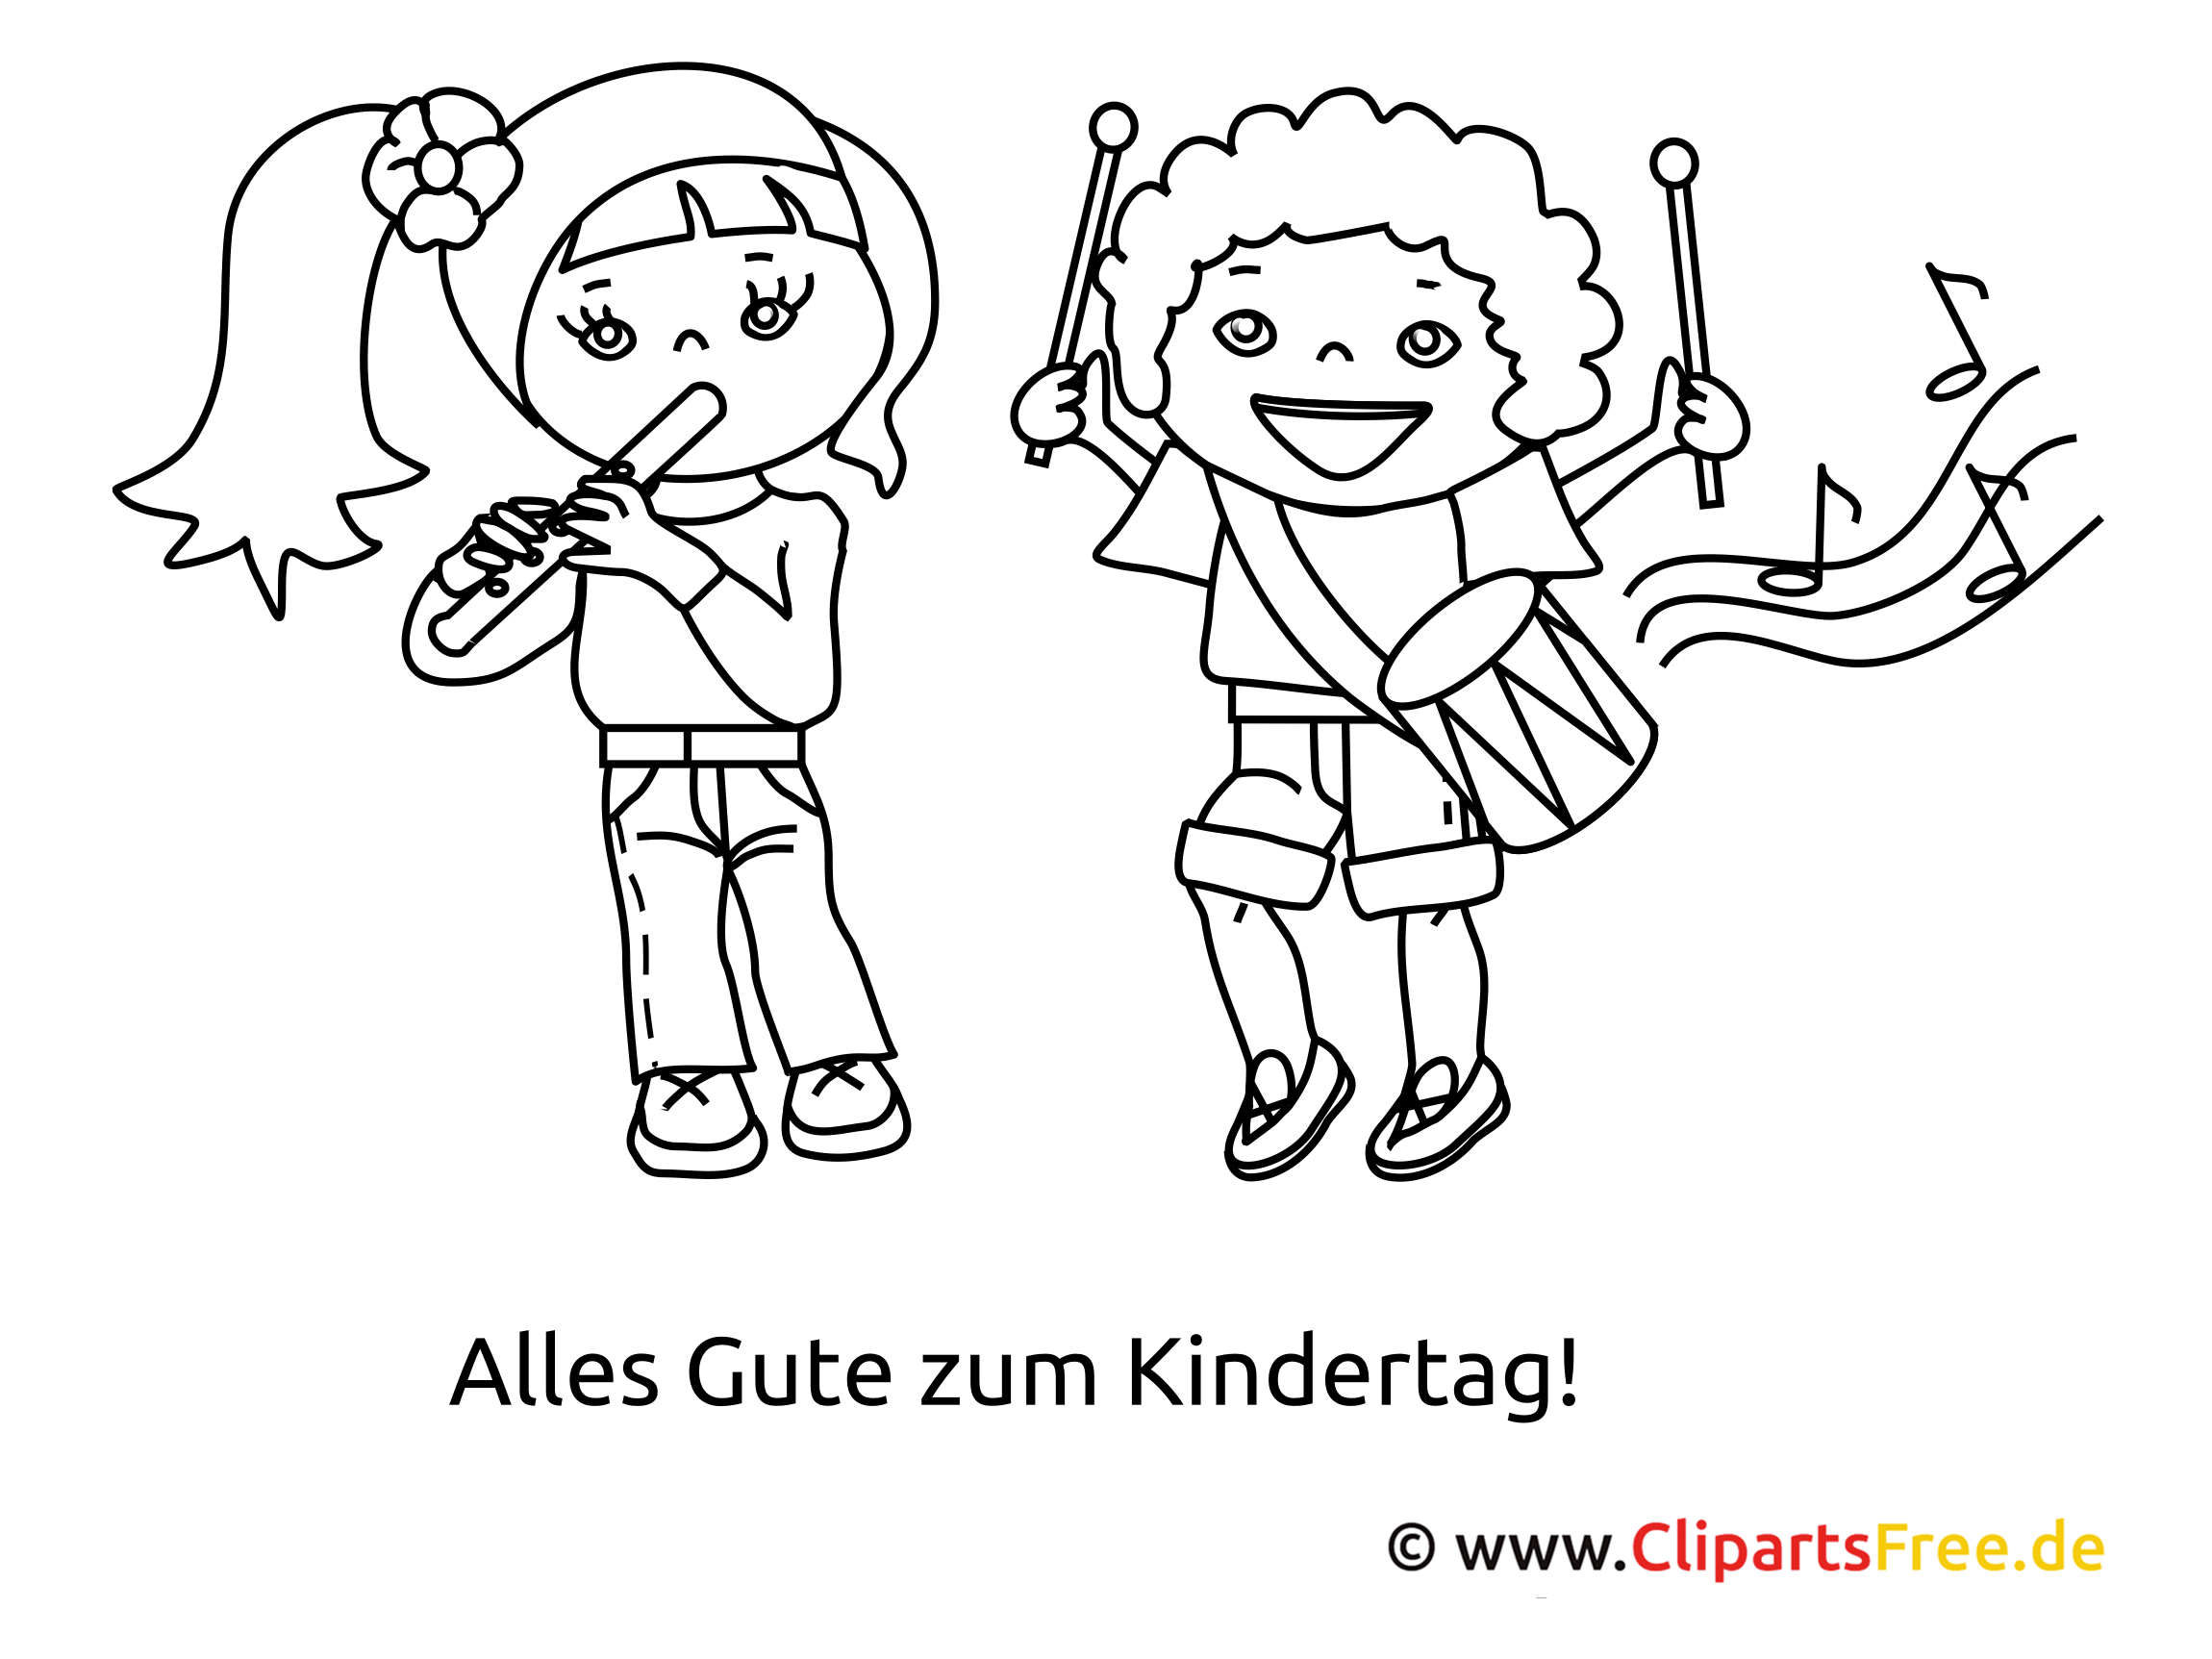 clipart kostenlos kindertag - photo #17